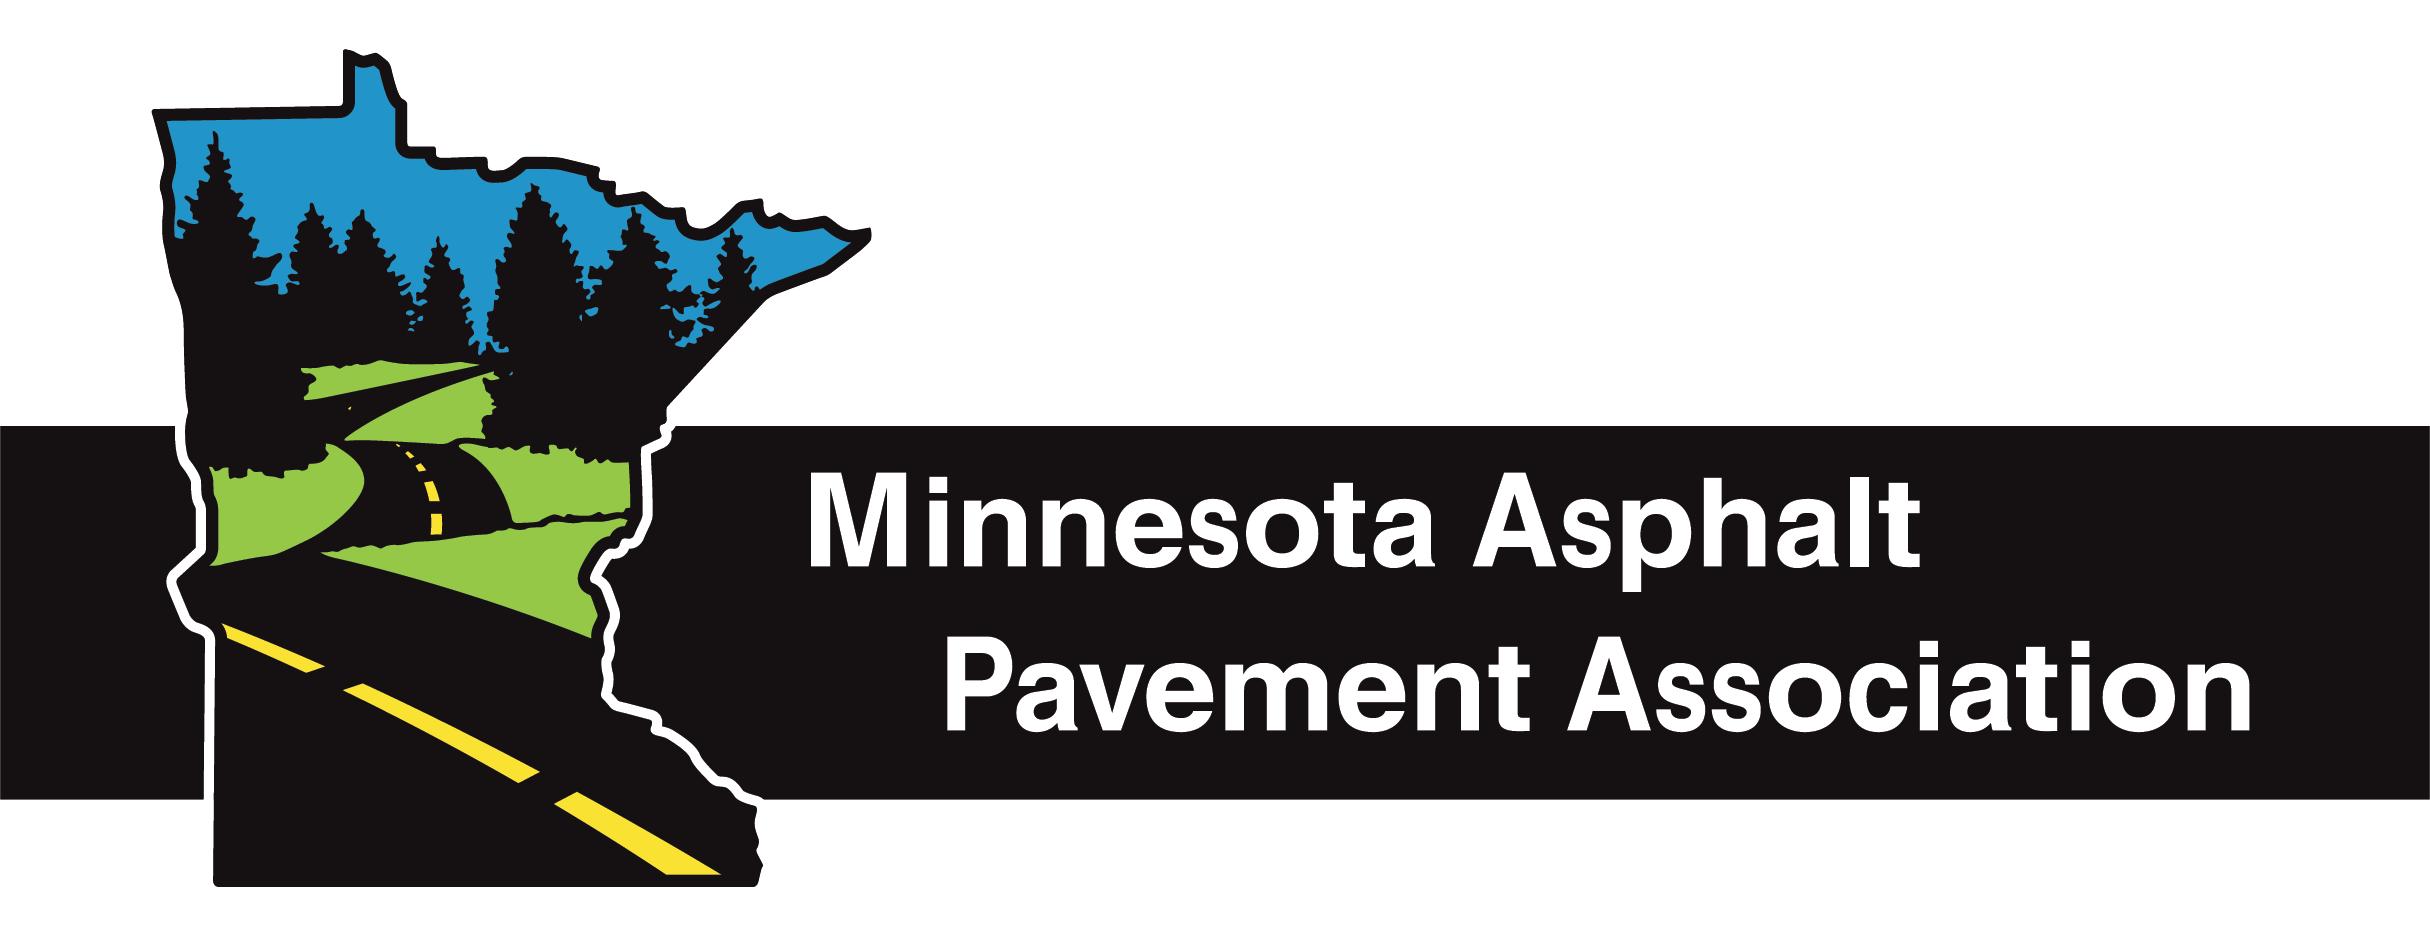 Minnesota Asphalt Pavement Association